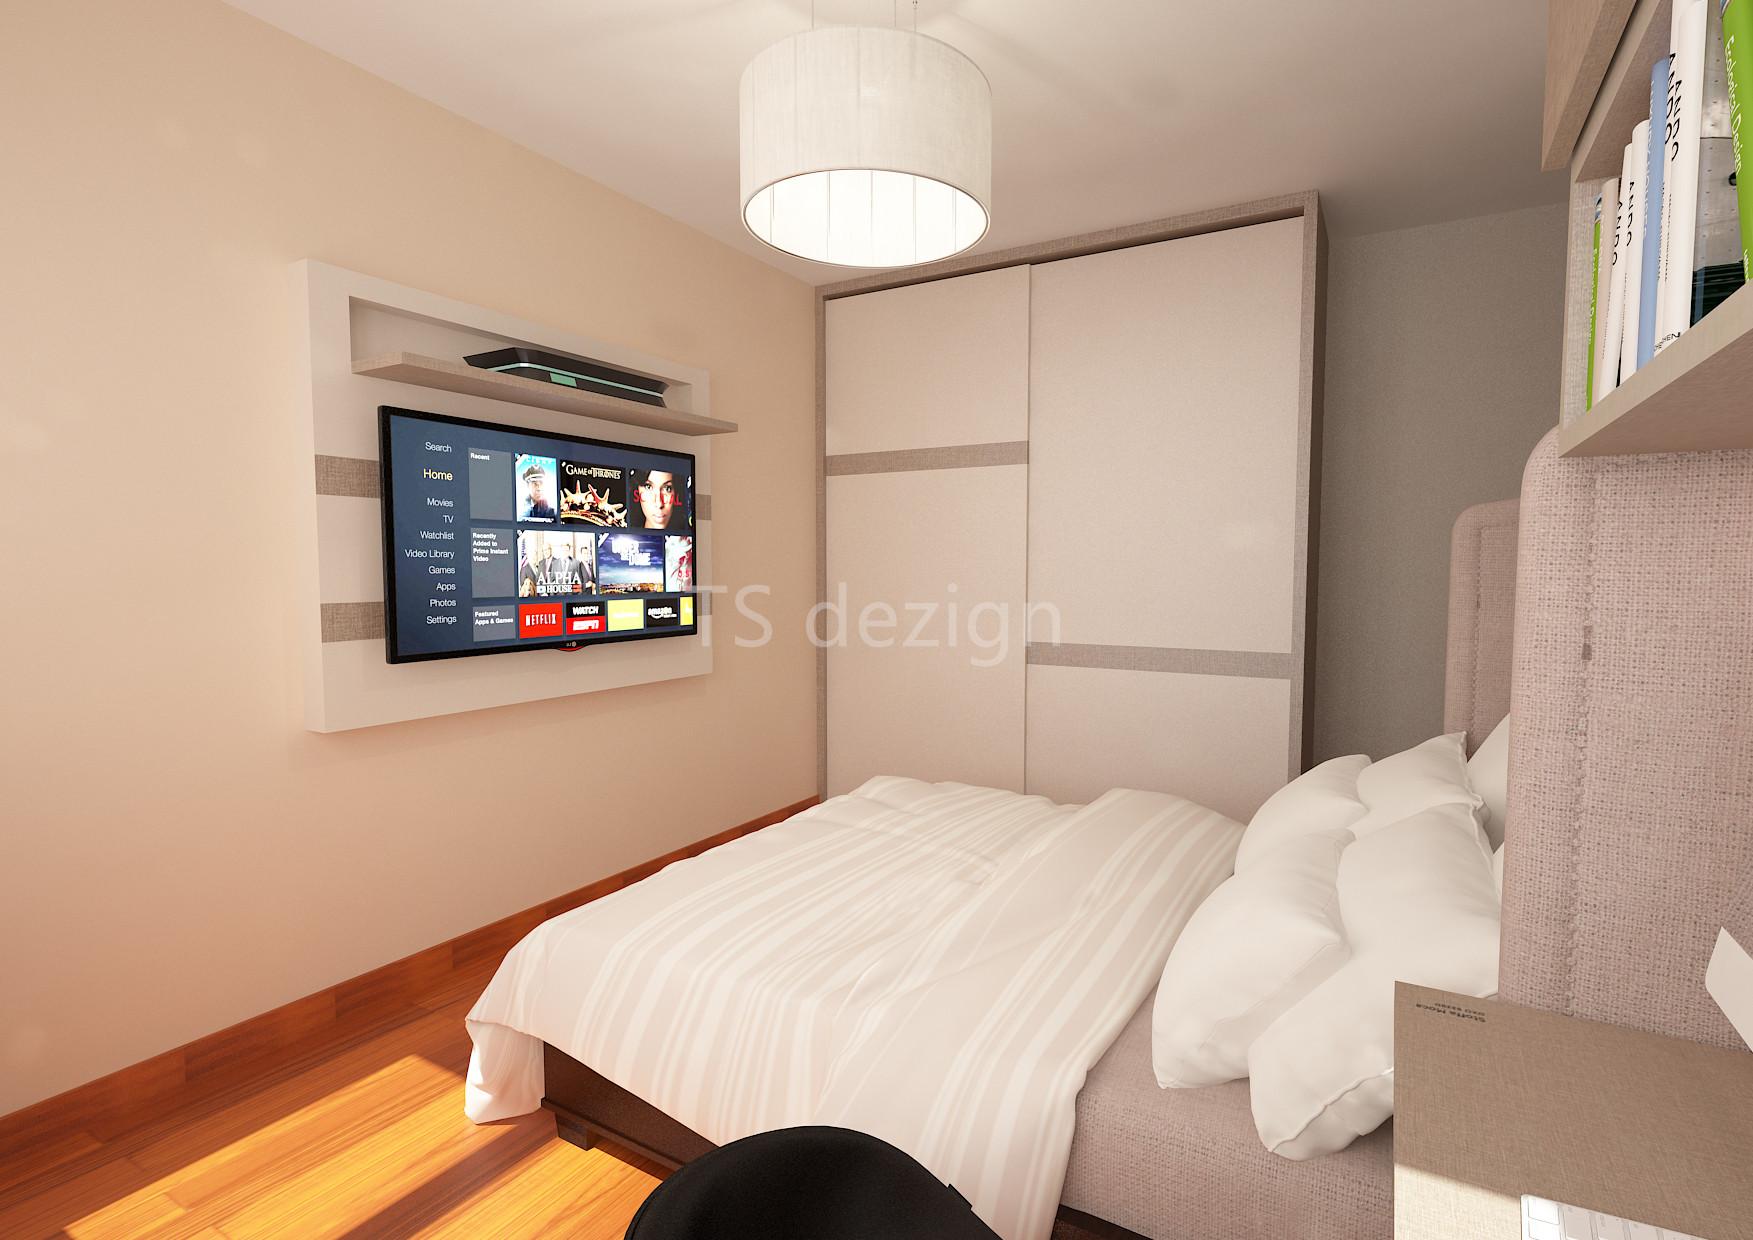 TS Dezign Anchorvale Cove HDB BTO 4 Room